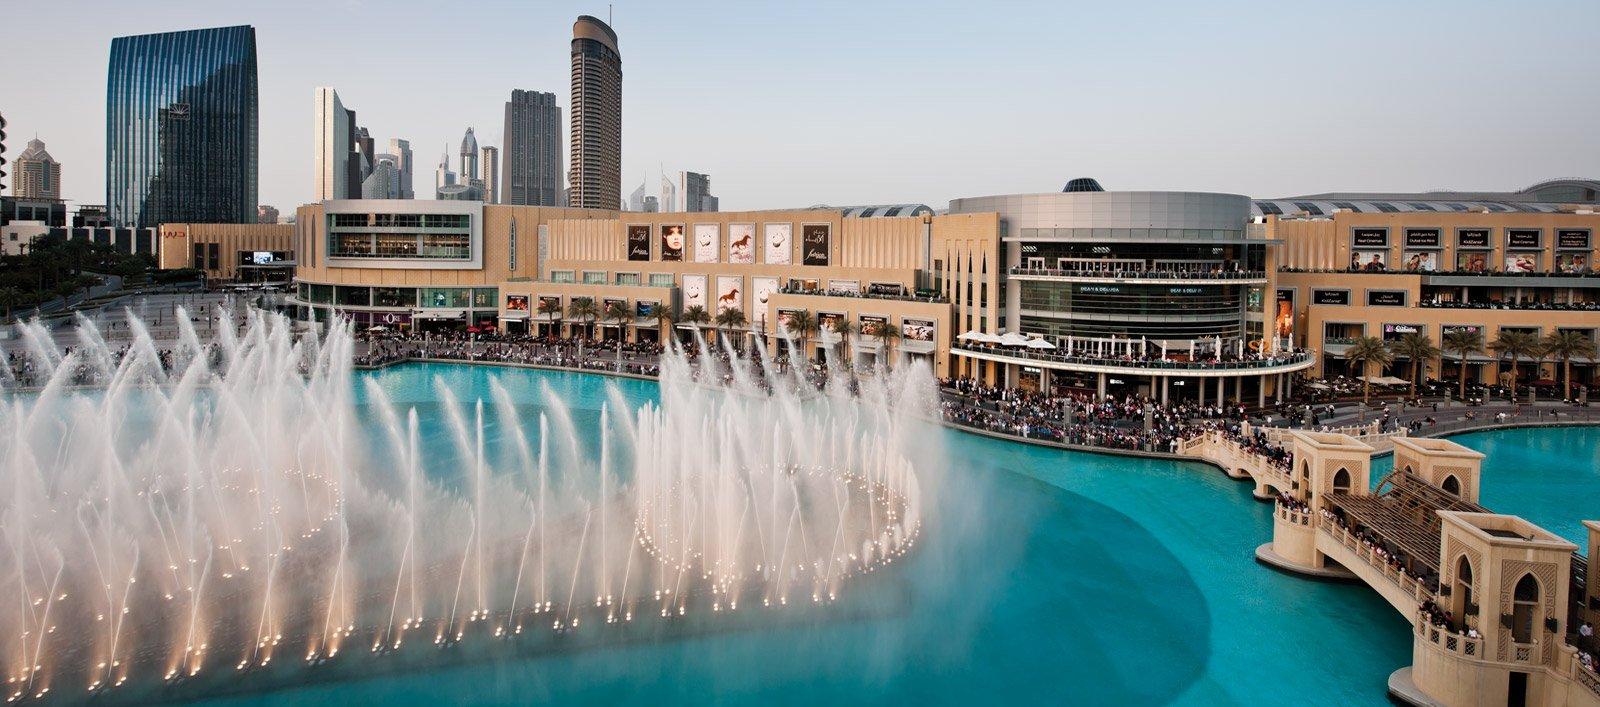 2018 The Hotel Show Dubai - Diae Conferences & Research Center